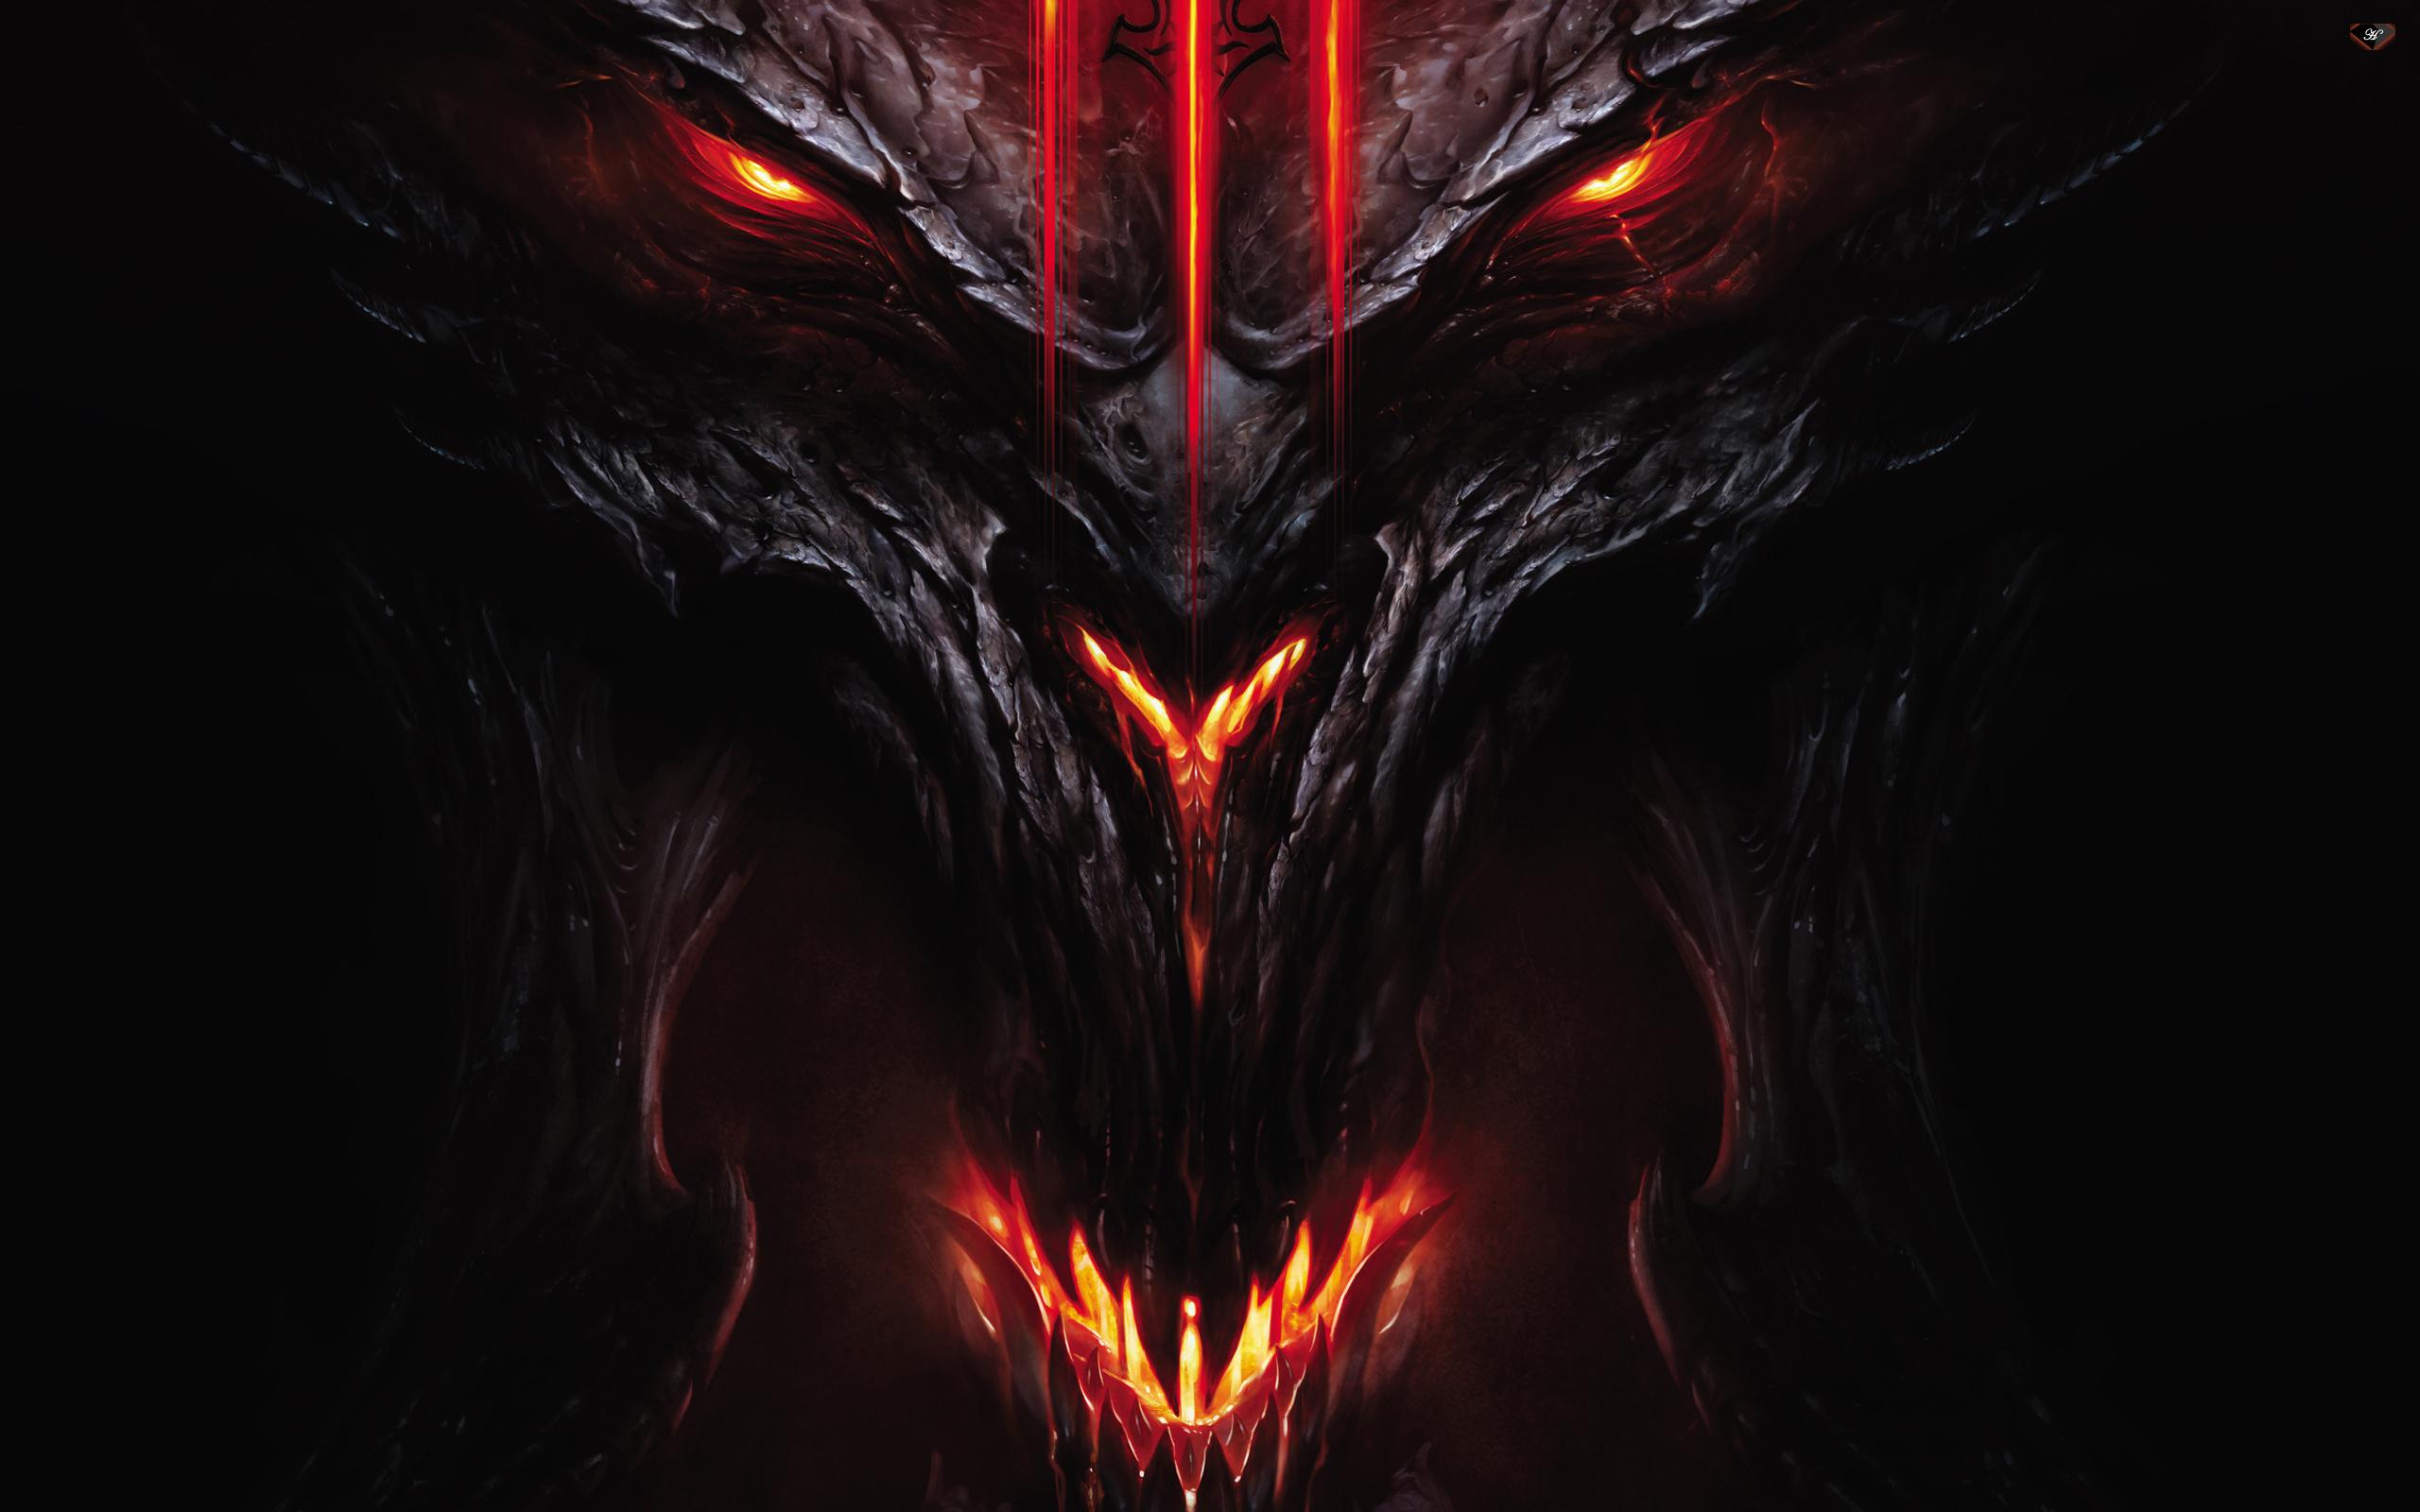 Wallpaper Devil demon Diablo 3 Diablo monster desktop 2560x1600